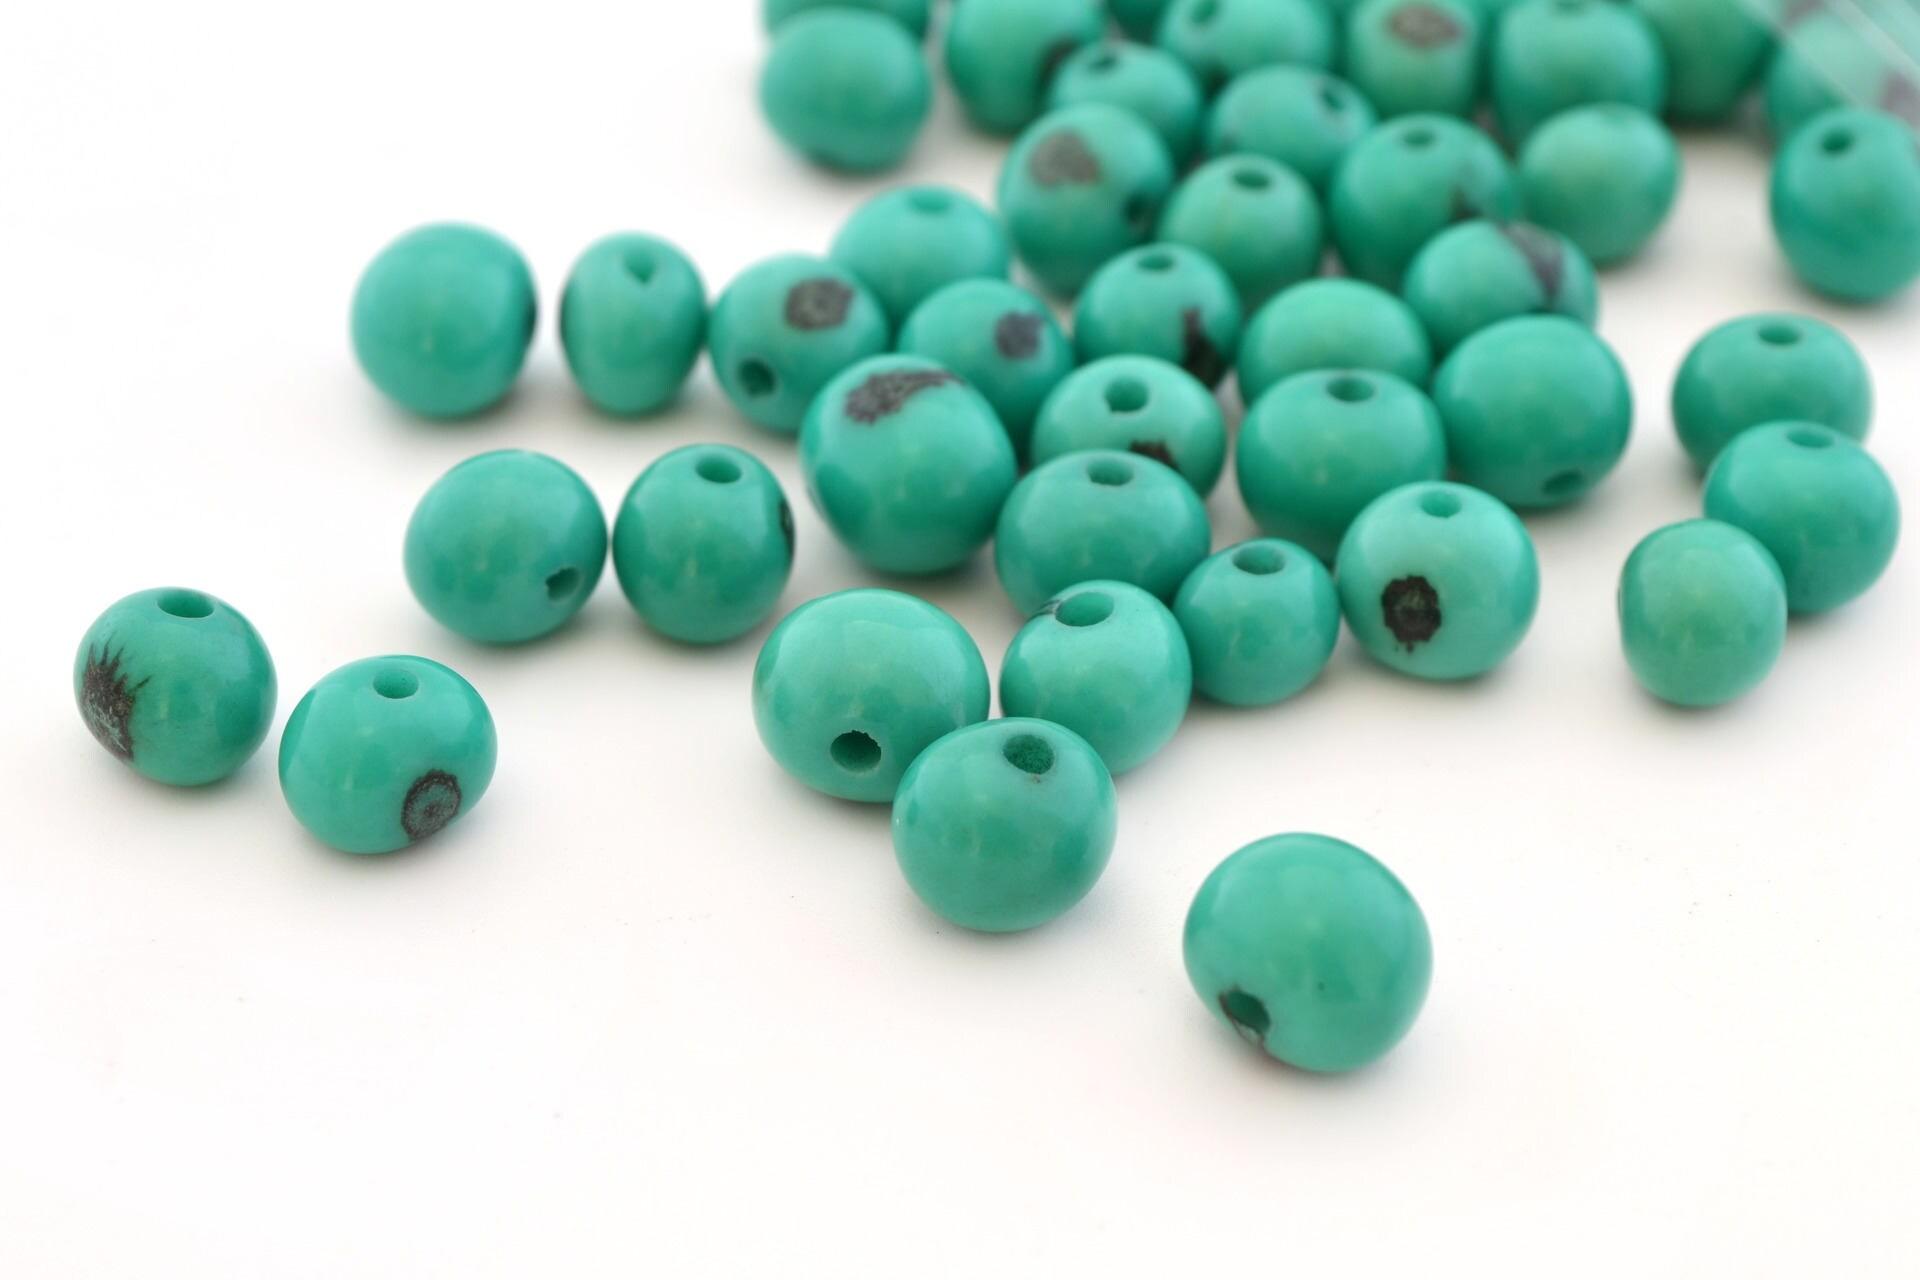 10 perles rondes vert meraude en graines d 39 a a 6 10mm etsy. Black Bedroom Furniture Sets. Home Design Ideas